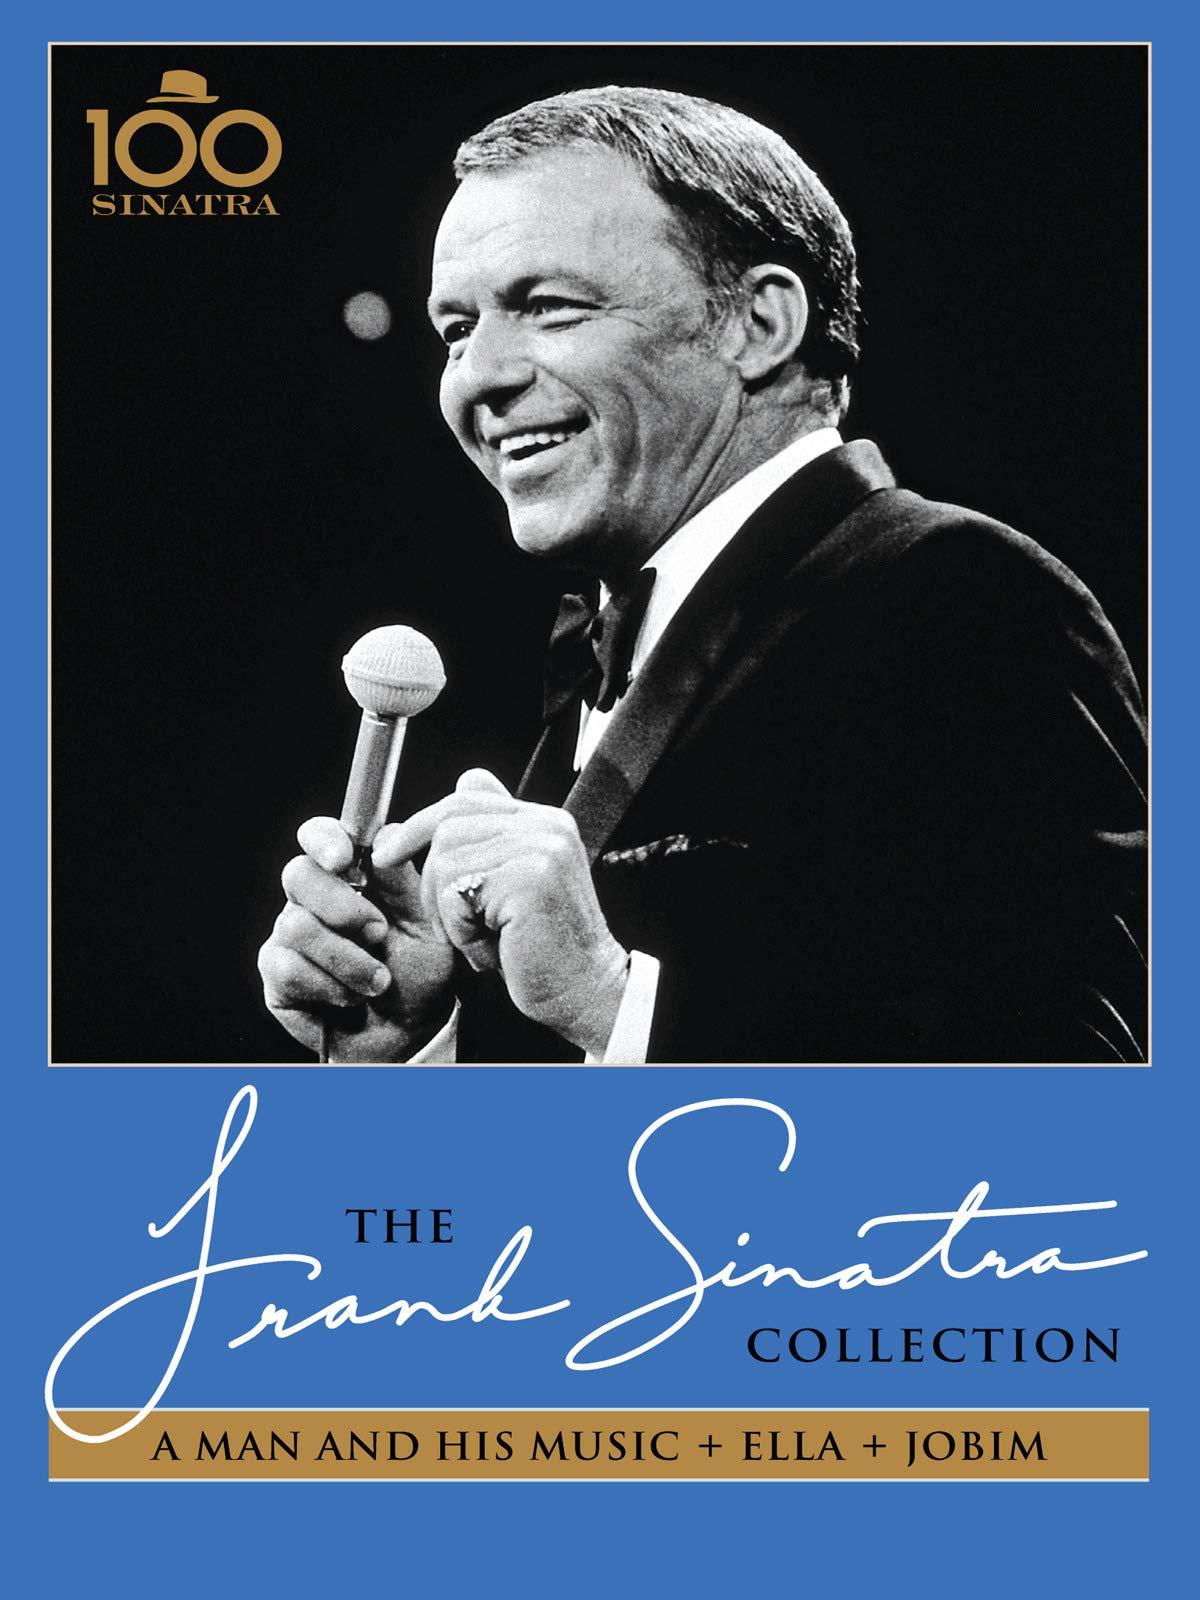 Frank Sinatra - A Man And His Music + Ella + Jobim